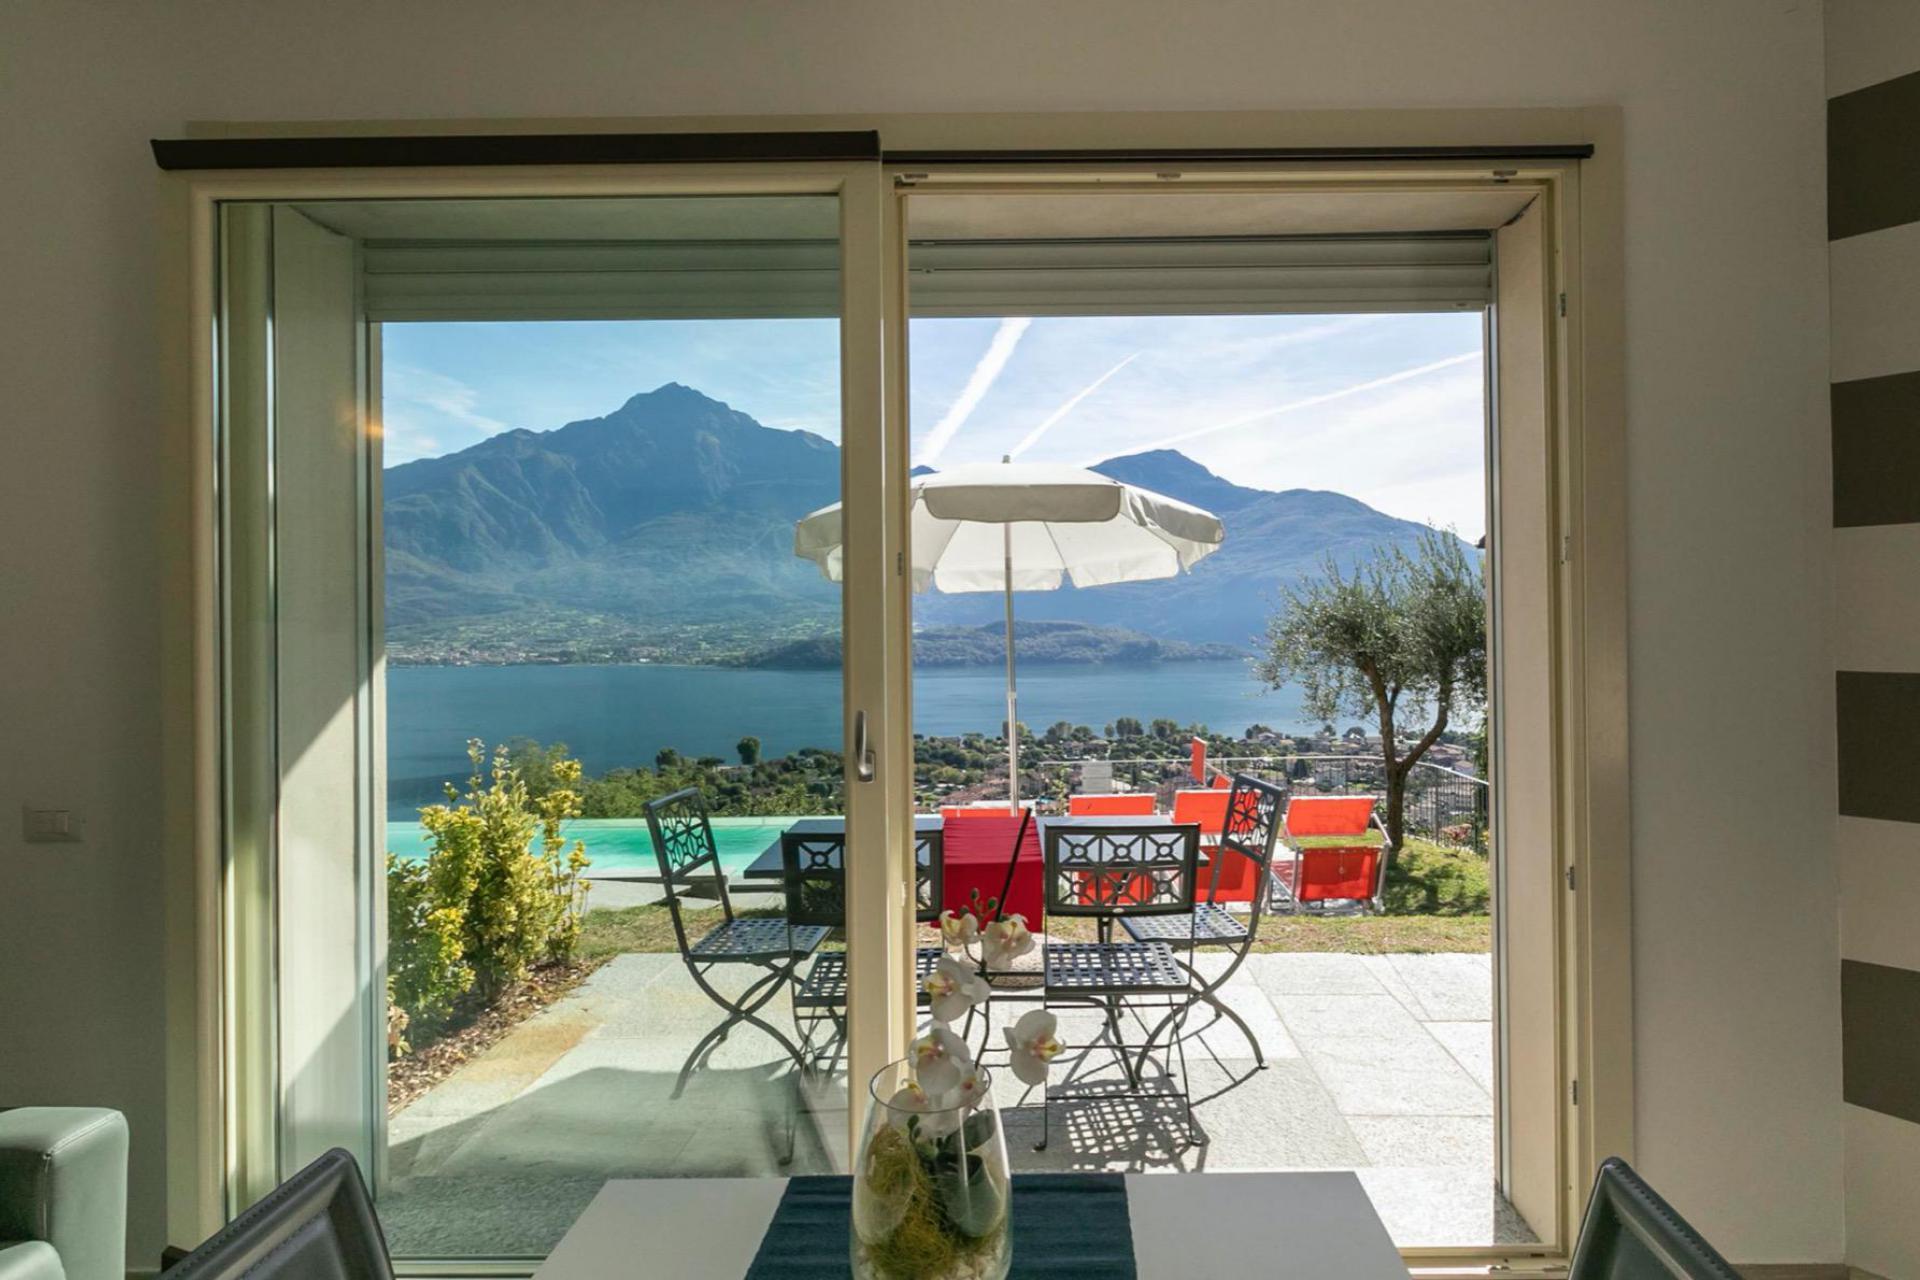 Agriturismo Lago di Como e lago di Garda Residence con vista unica sul Lago di Como